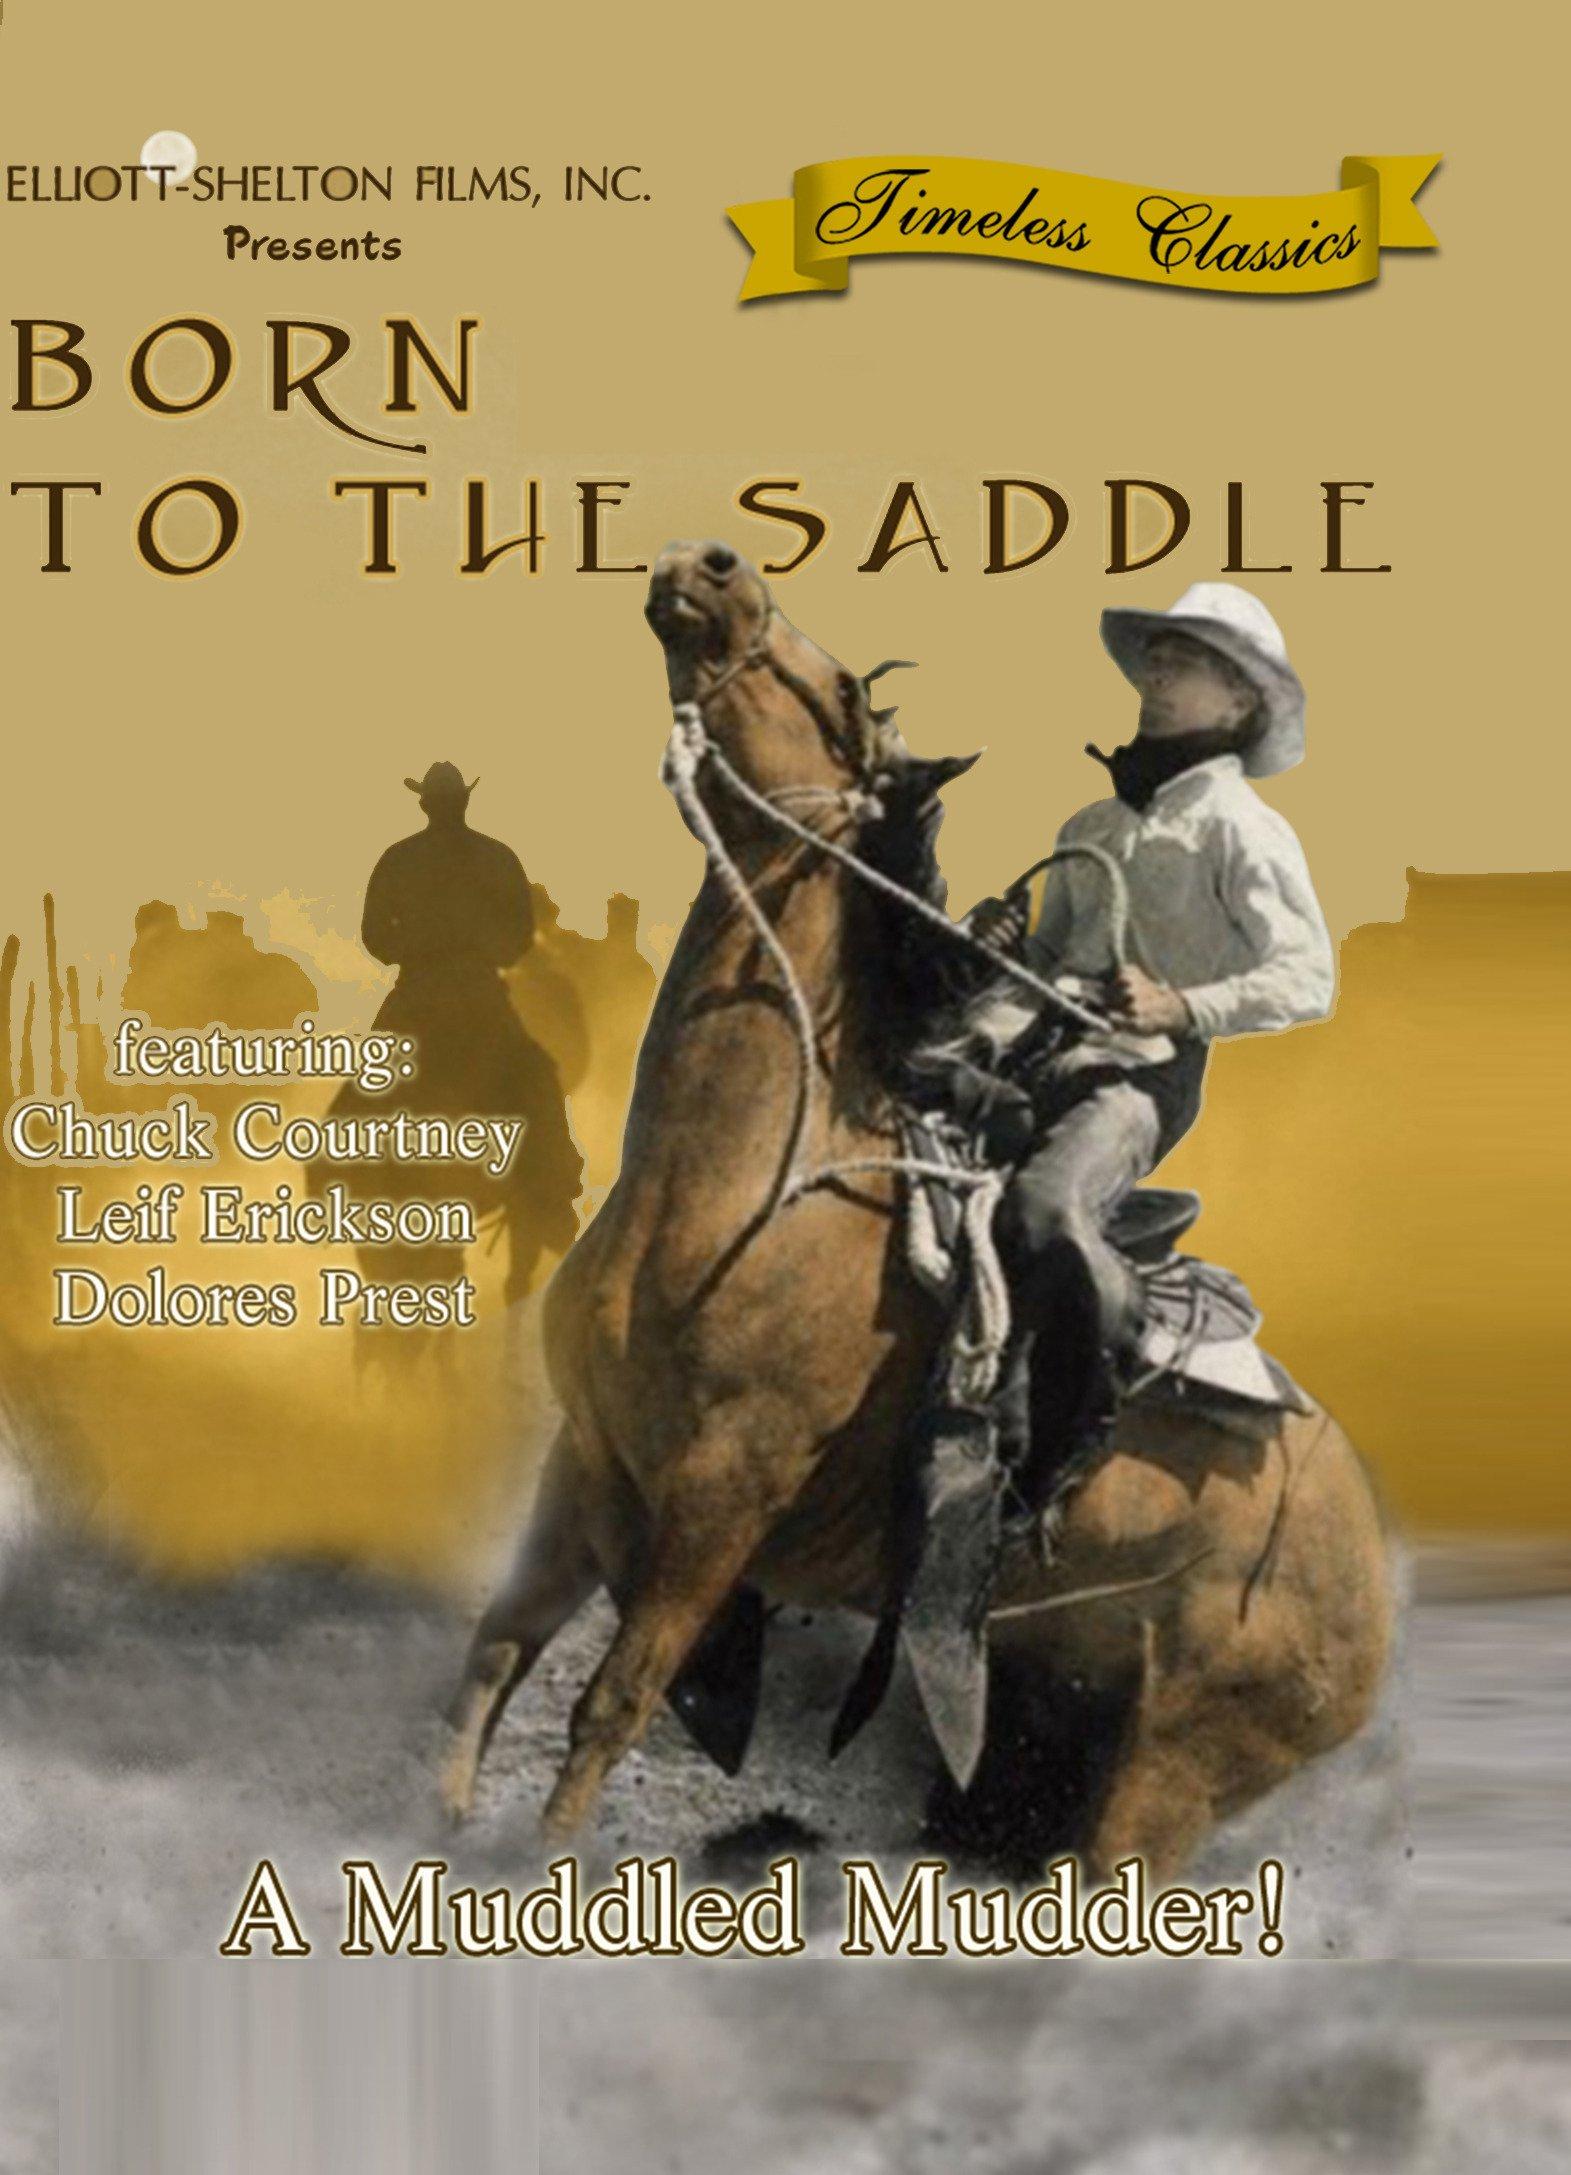 Born to the Saddle (1953)